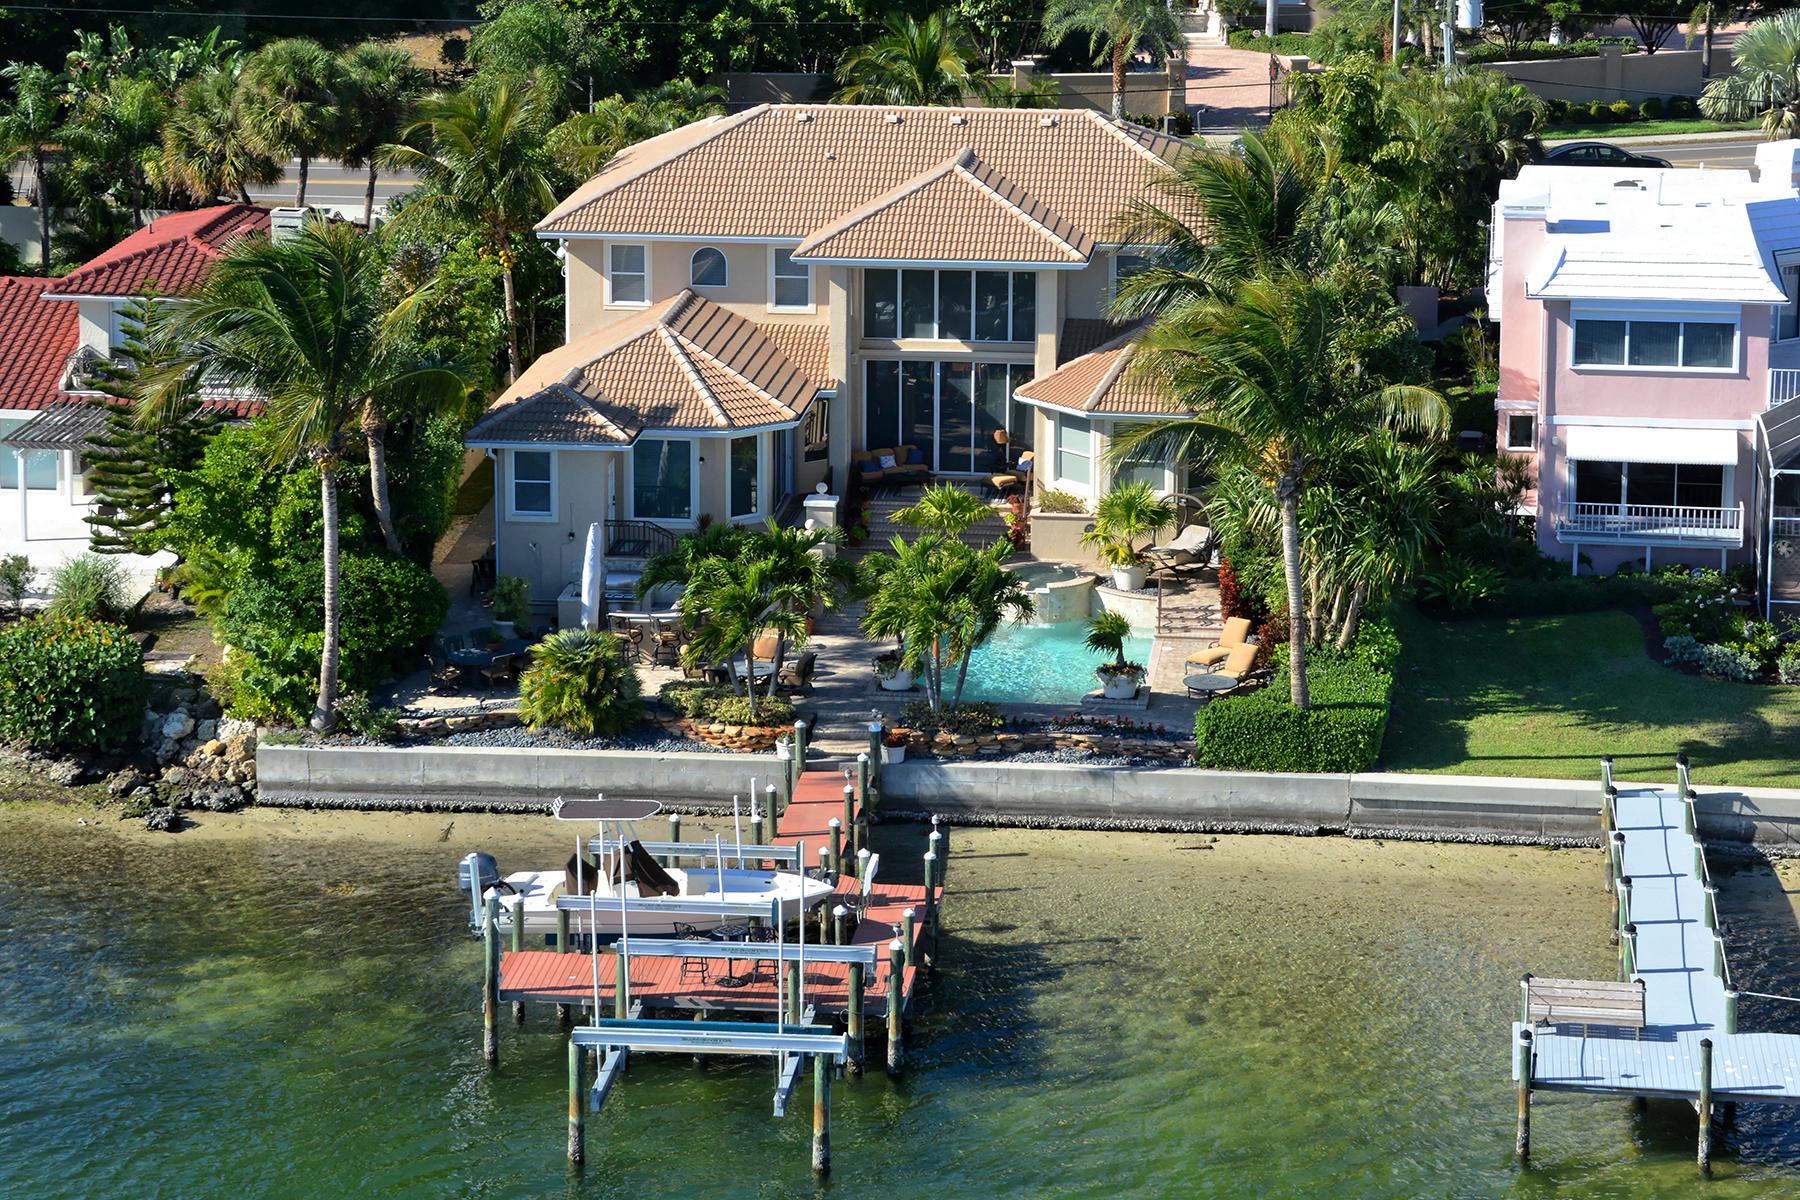 Casa Unifamiliar por un Venta en LIDO C 1448 John Ringling Pkwy Sarasota, Florida, 34236 Estados Unidos